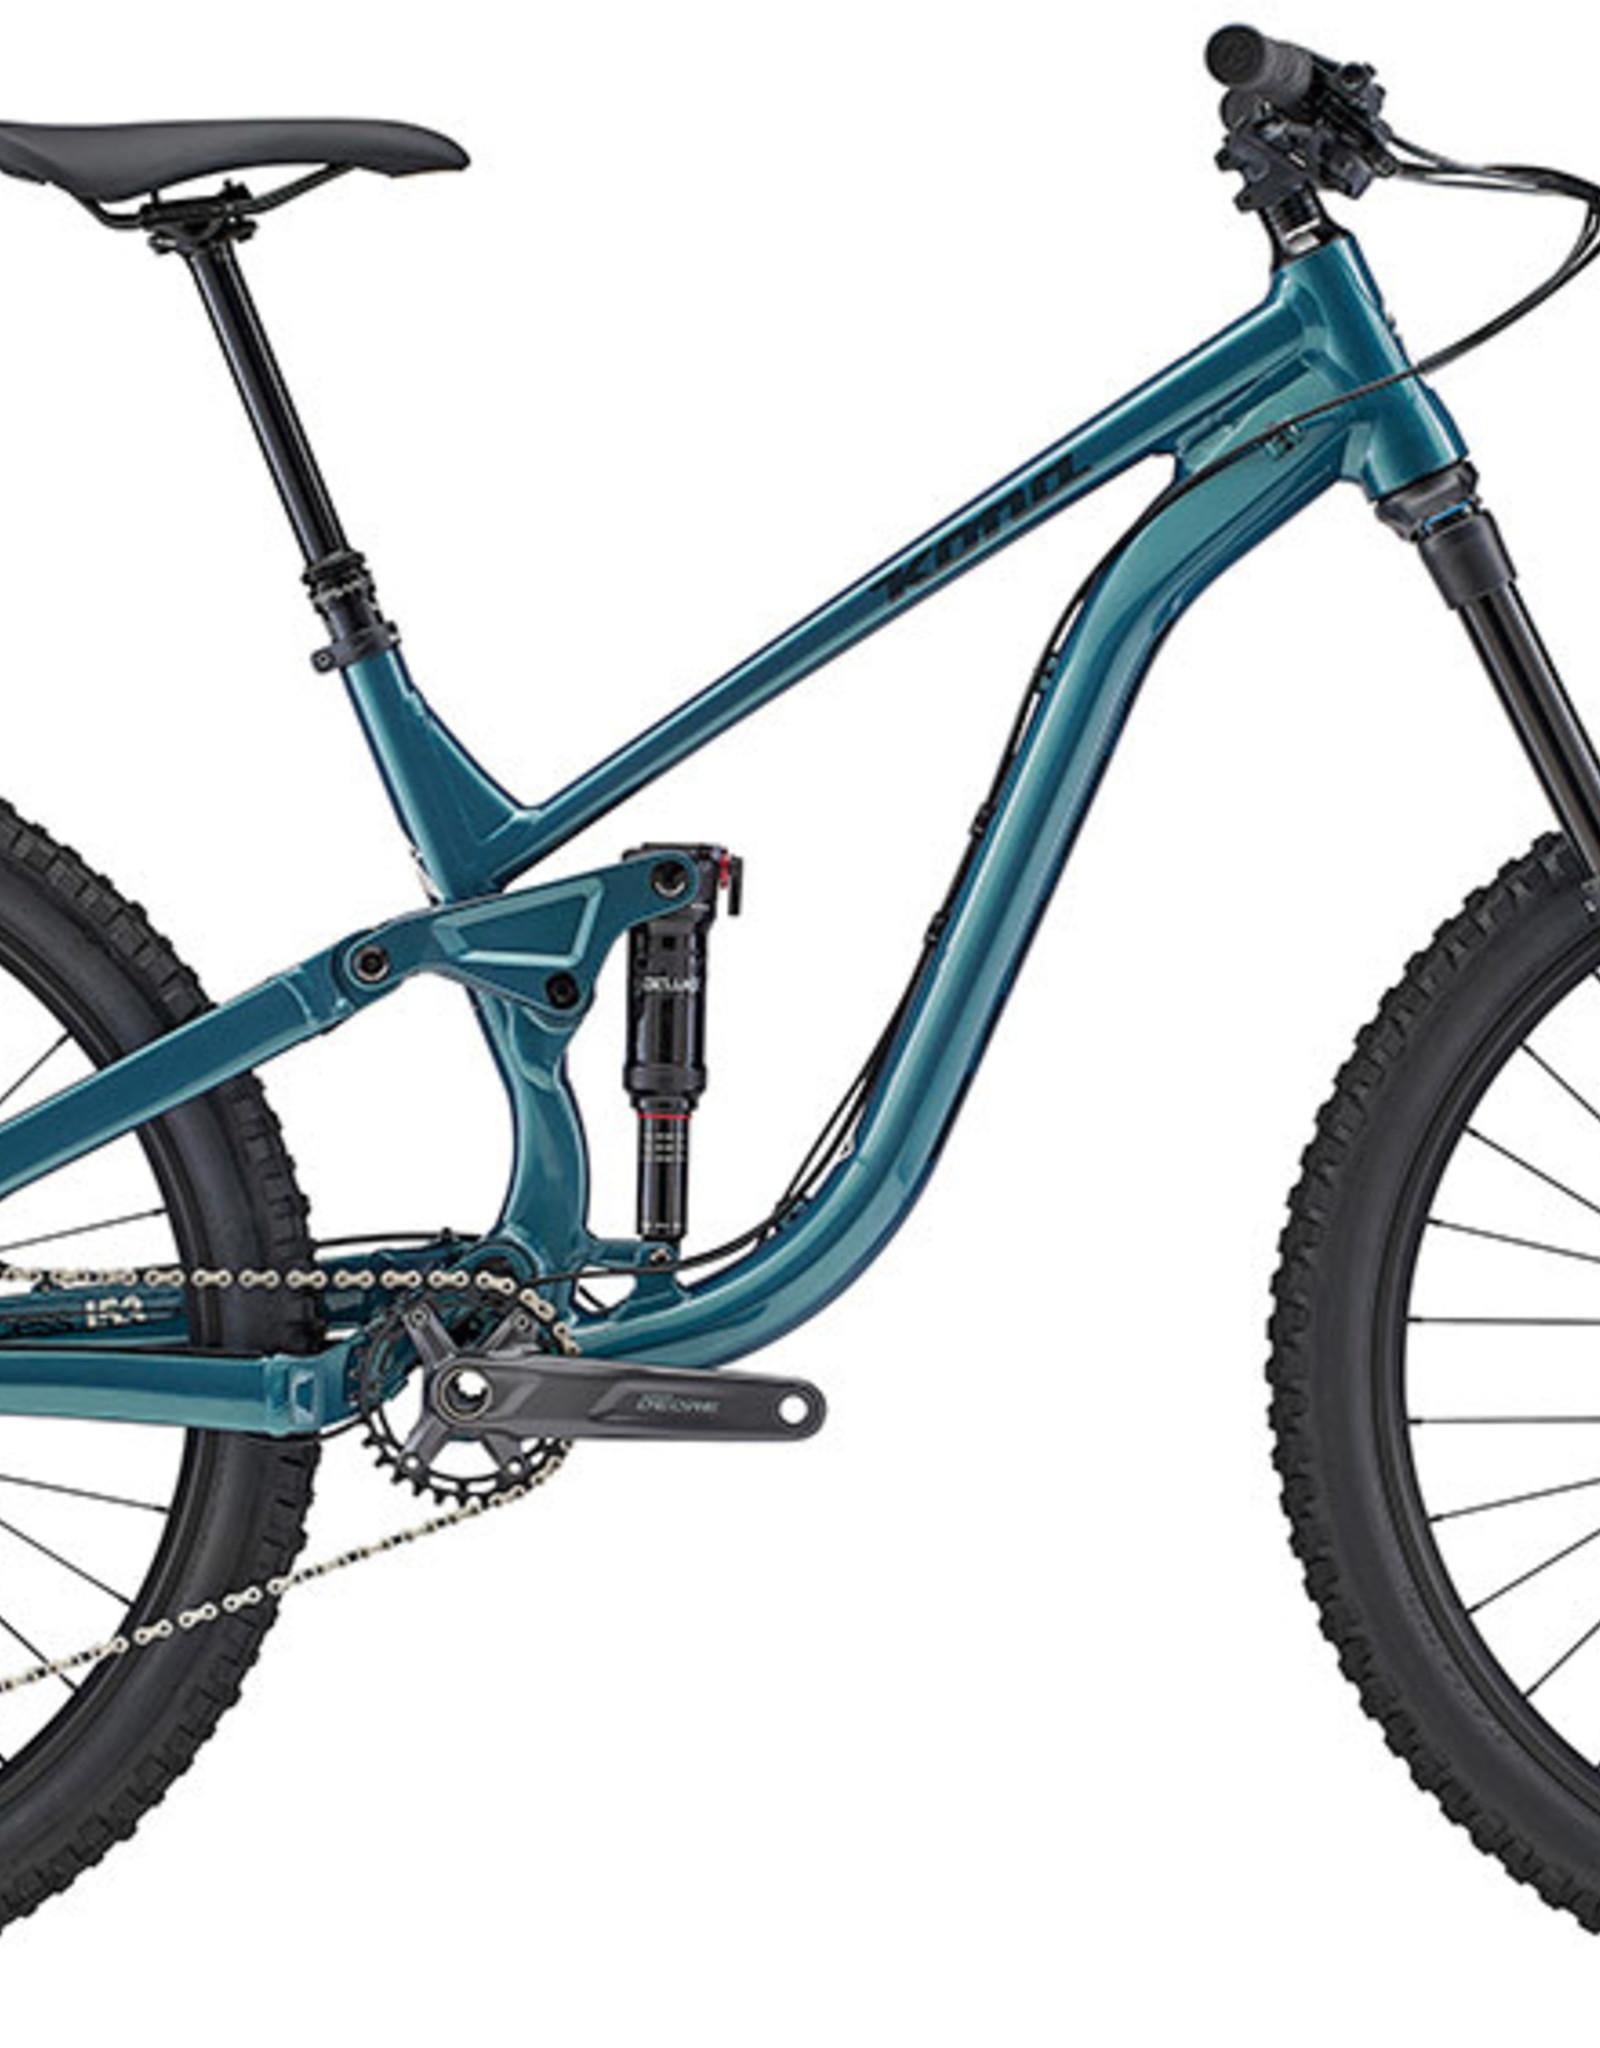 Kona Bicycles 2022 Kona Process 153 27.5 Complete Small